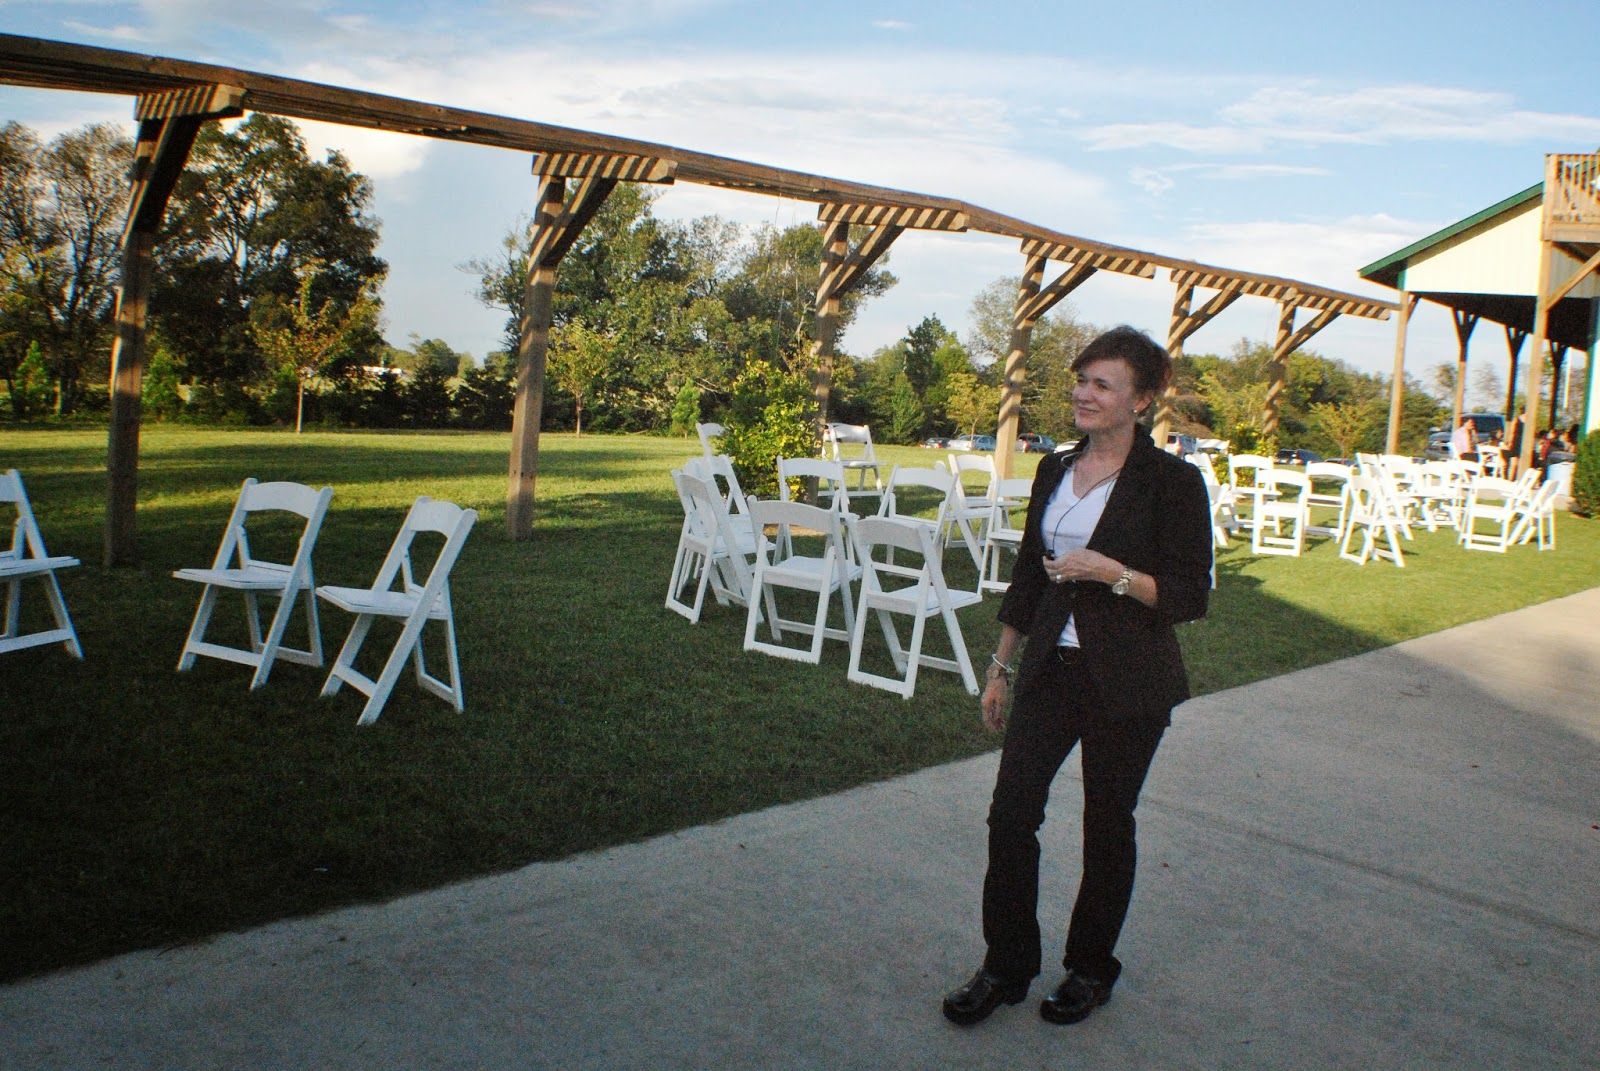 With Class LLC Wedding Coordination Party DJ - Sunrise Farm - Trenton, GA - Cheron J Douglas CWP - Certified Wedding Planner